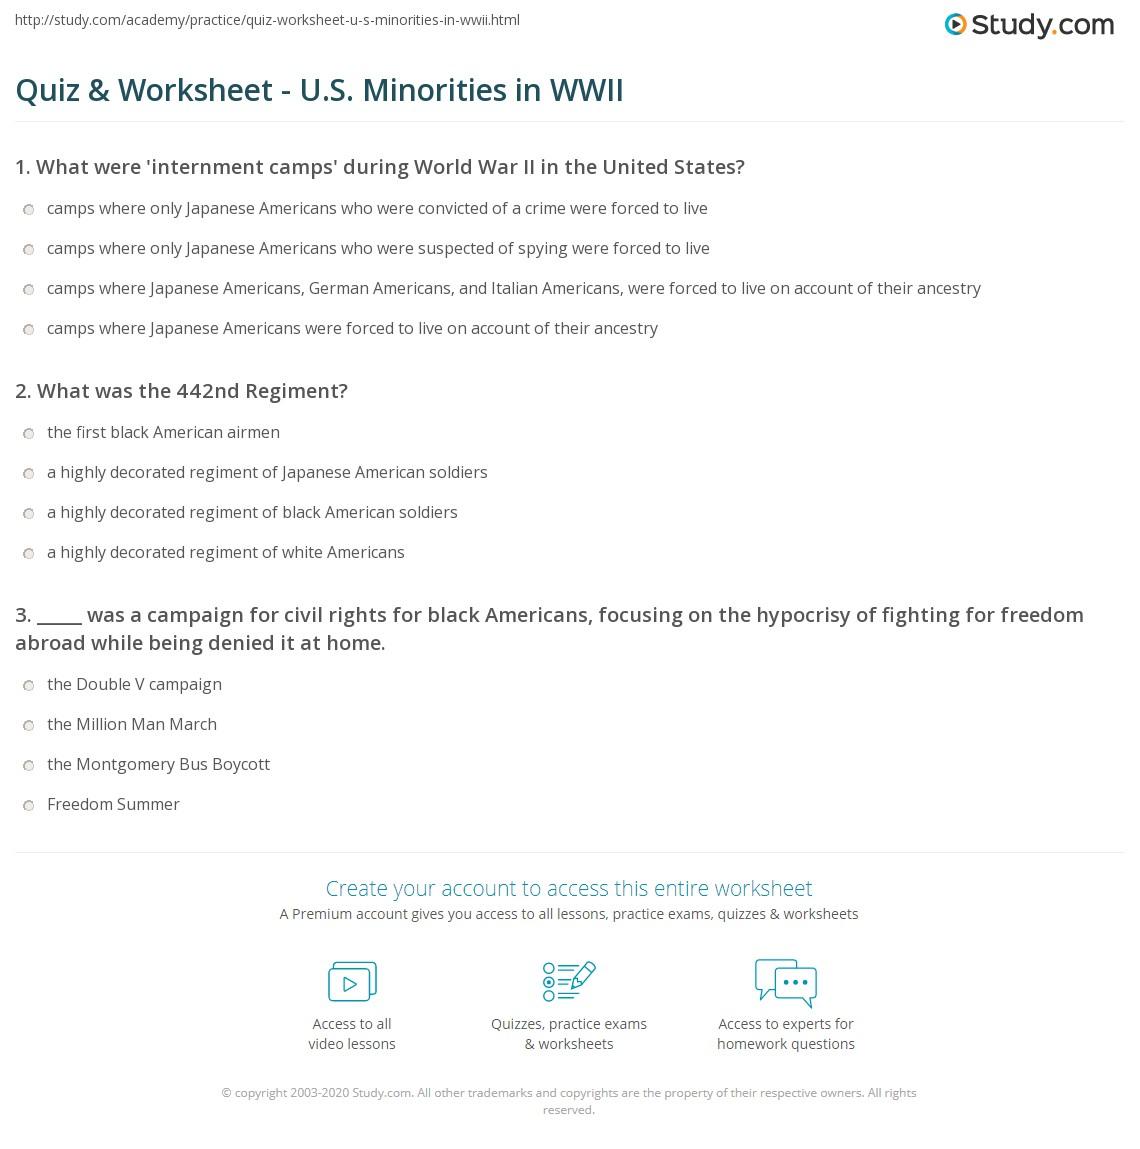 worksheet Civil Rights Worksheets quiz worksheet u s minorities in wwii study com print world war ii treatment civil rights worksheet